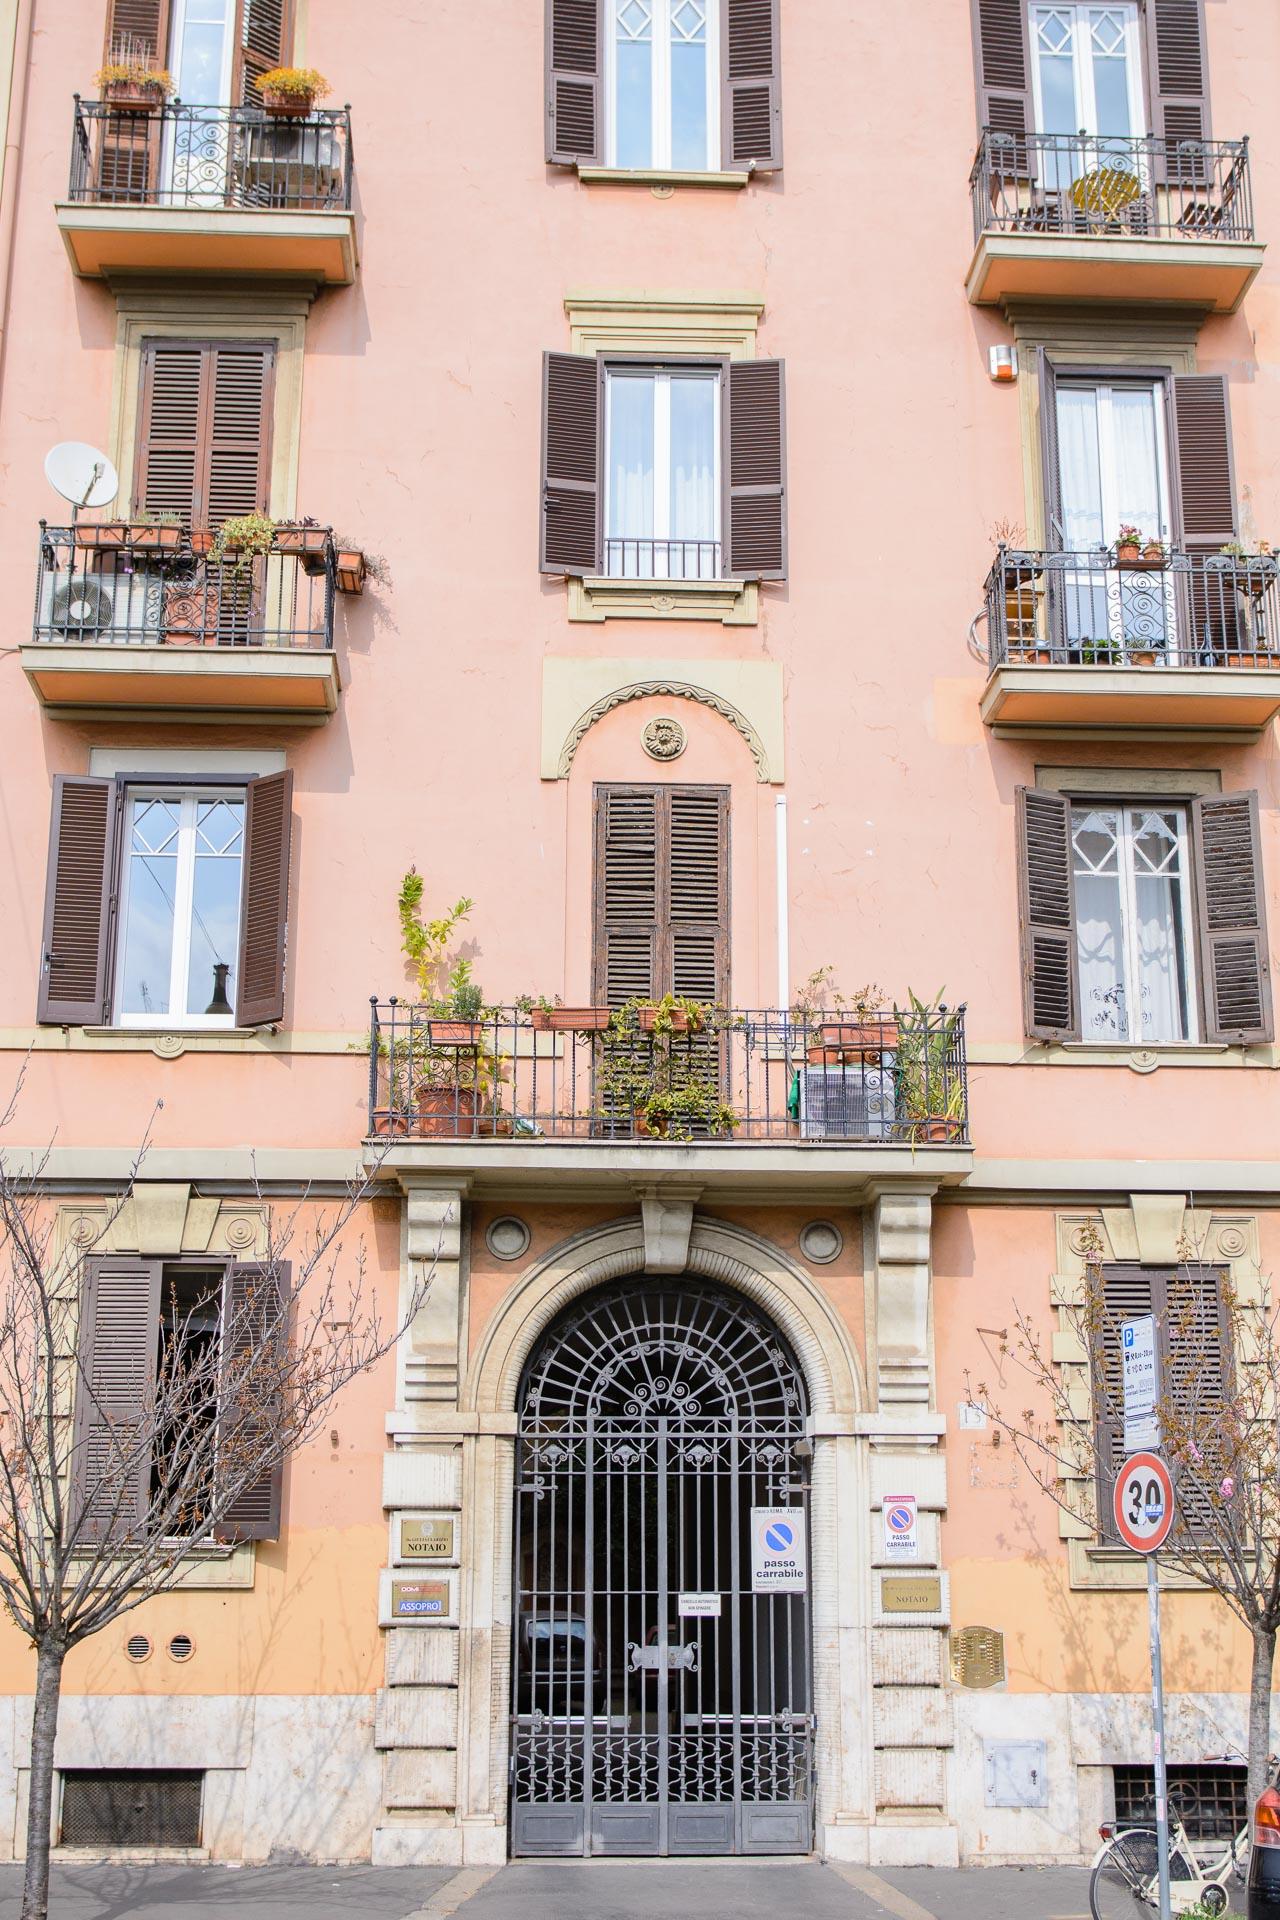 Rome travel guide blogger